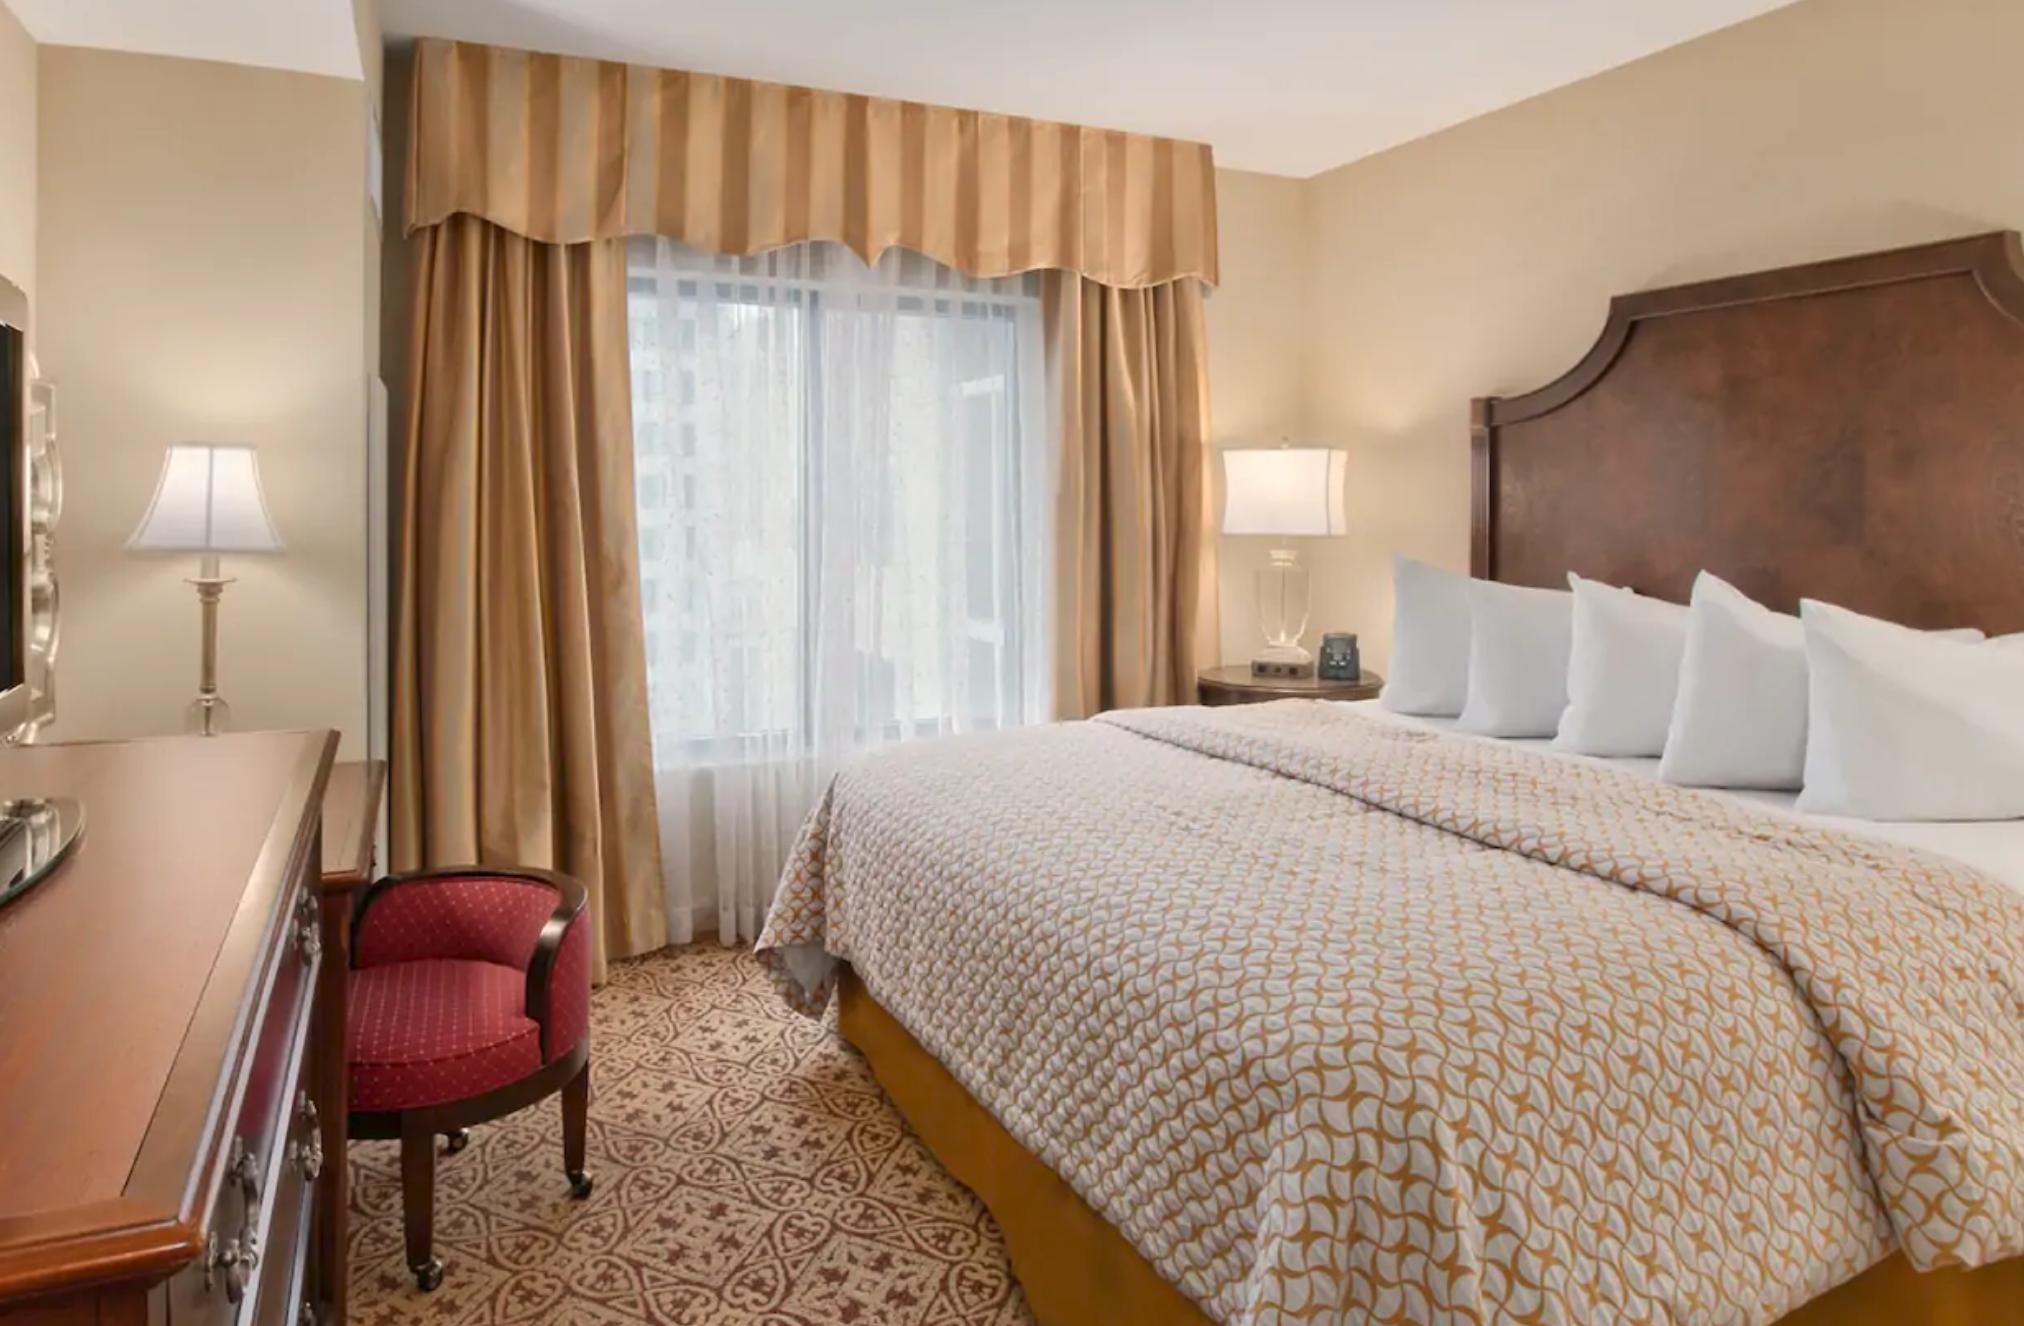 https://www.hotelsbyday.com/_data/default-hotel_image/4/20549/screenshot-2020-08-14-at-12-38-12-pm.png